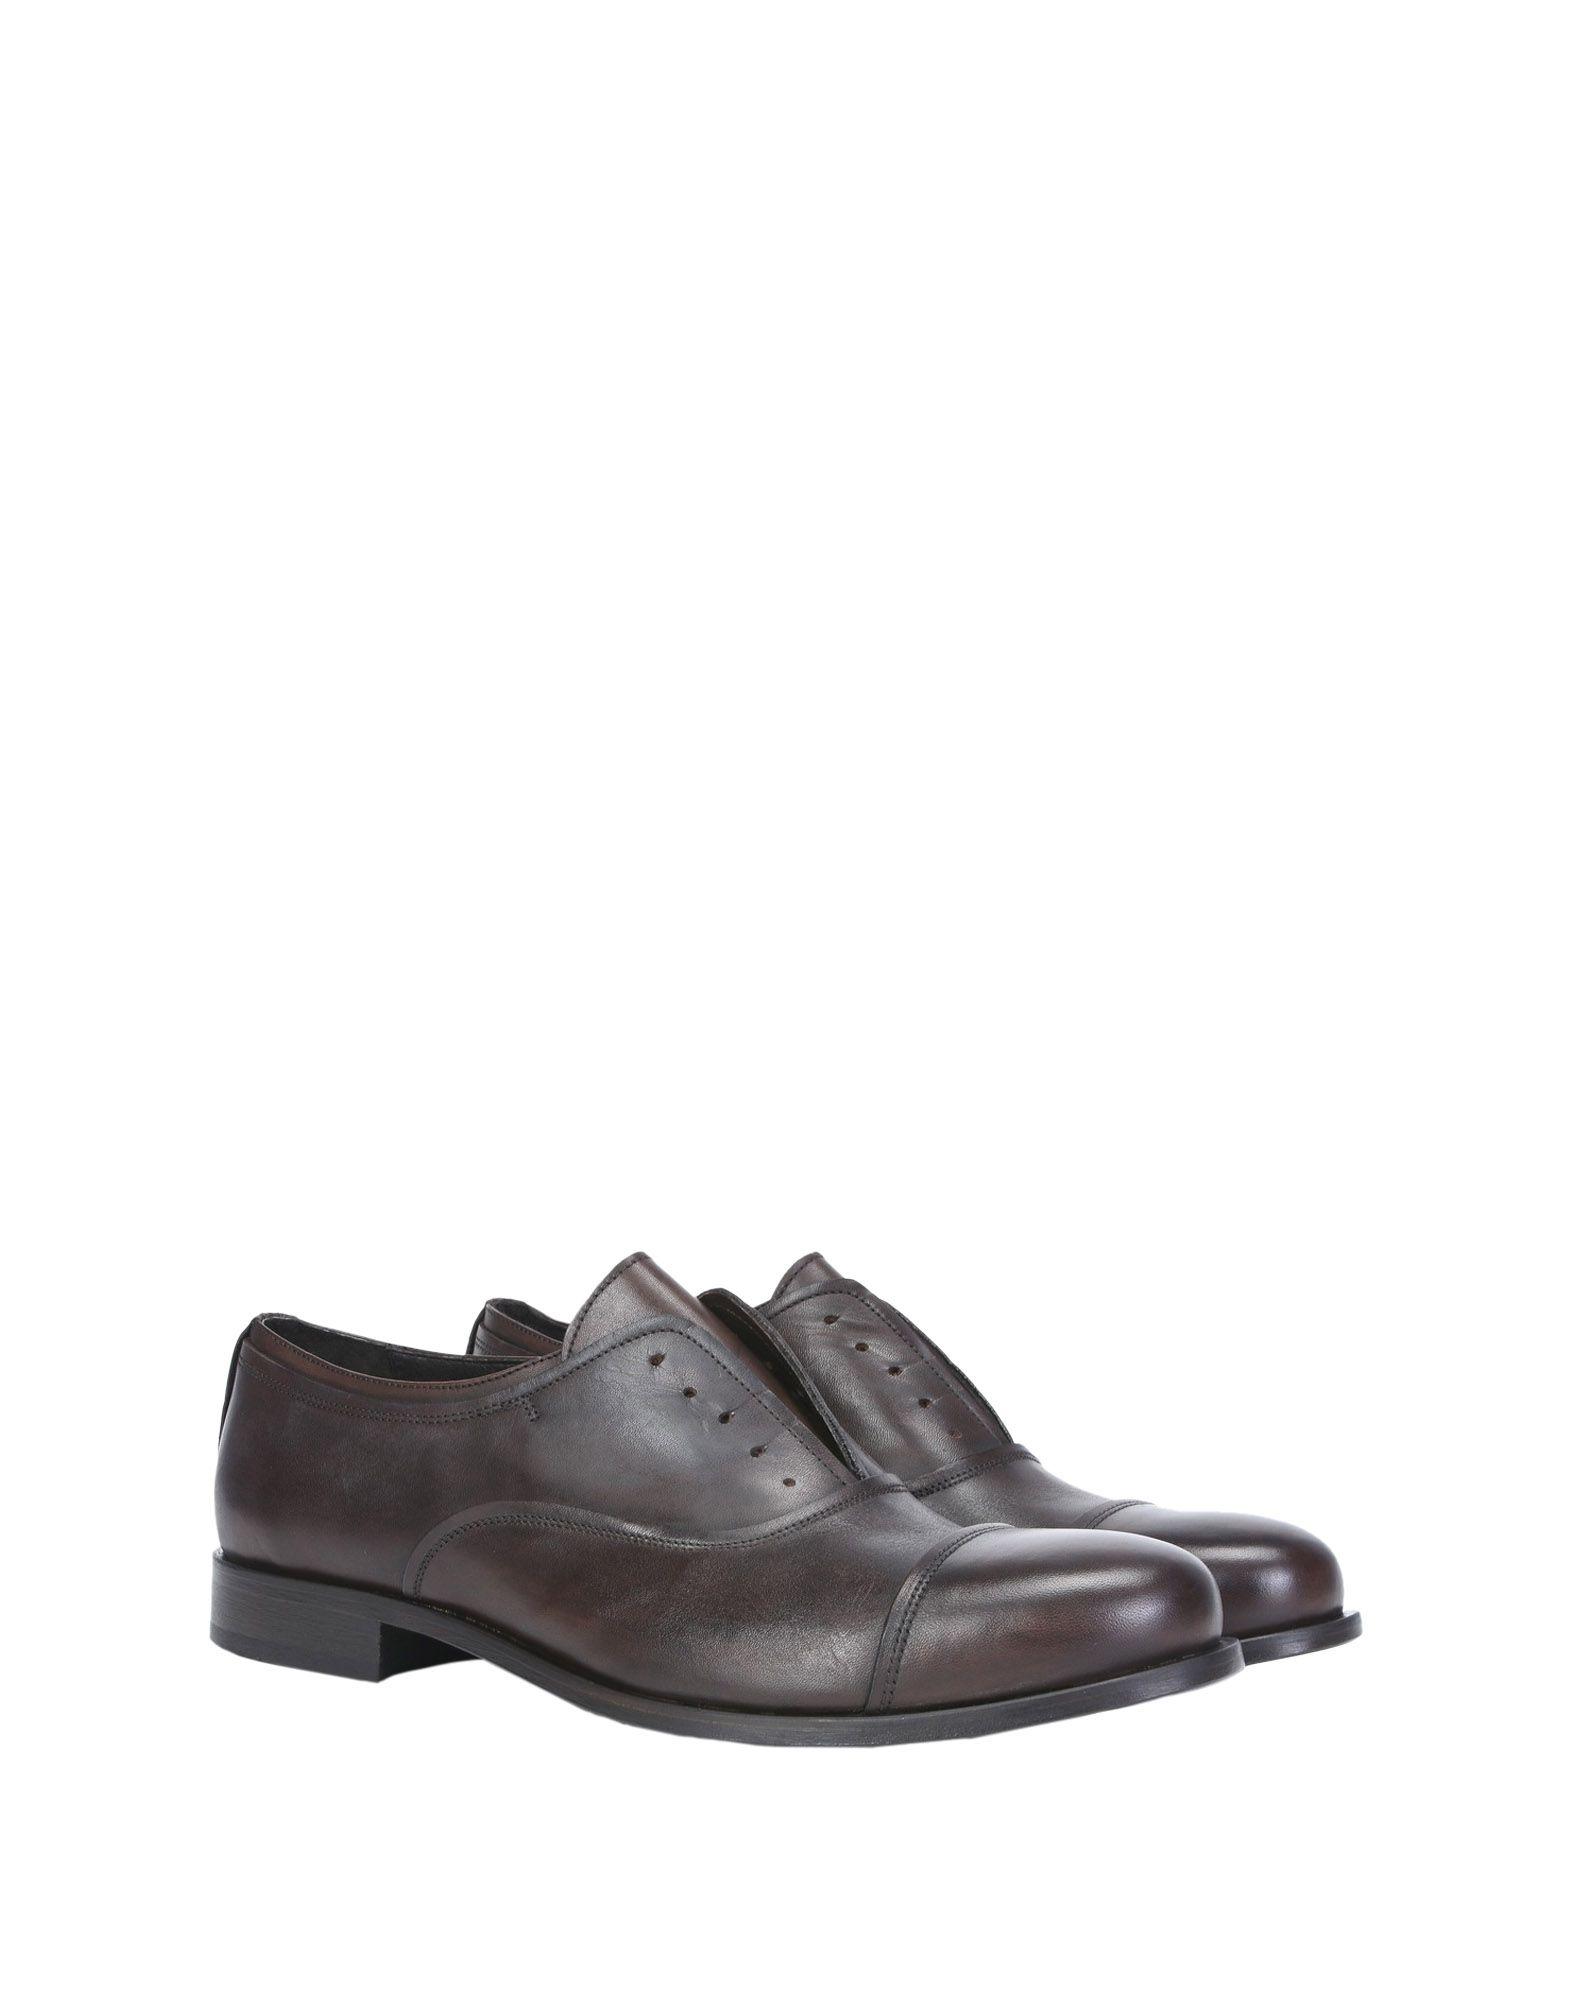 Maldini Heiße Schnürschuhe Herren  11523244PO Heiße Maldini Schuhe 8b3750